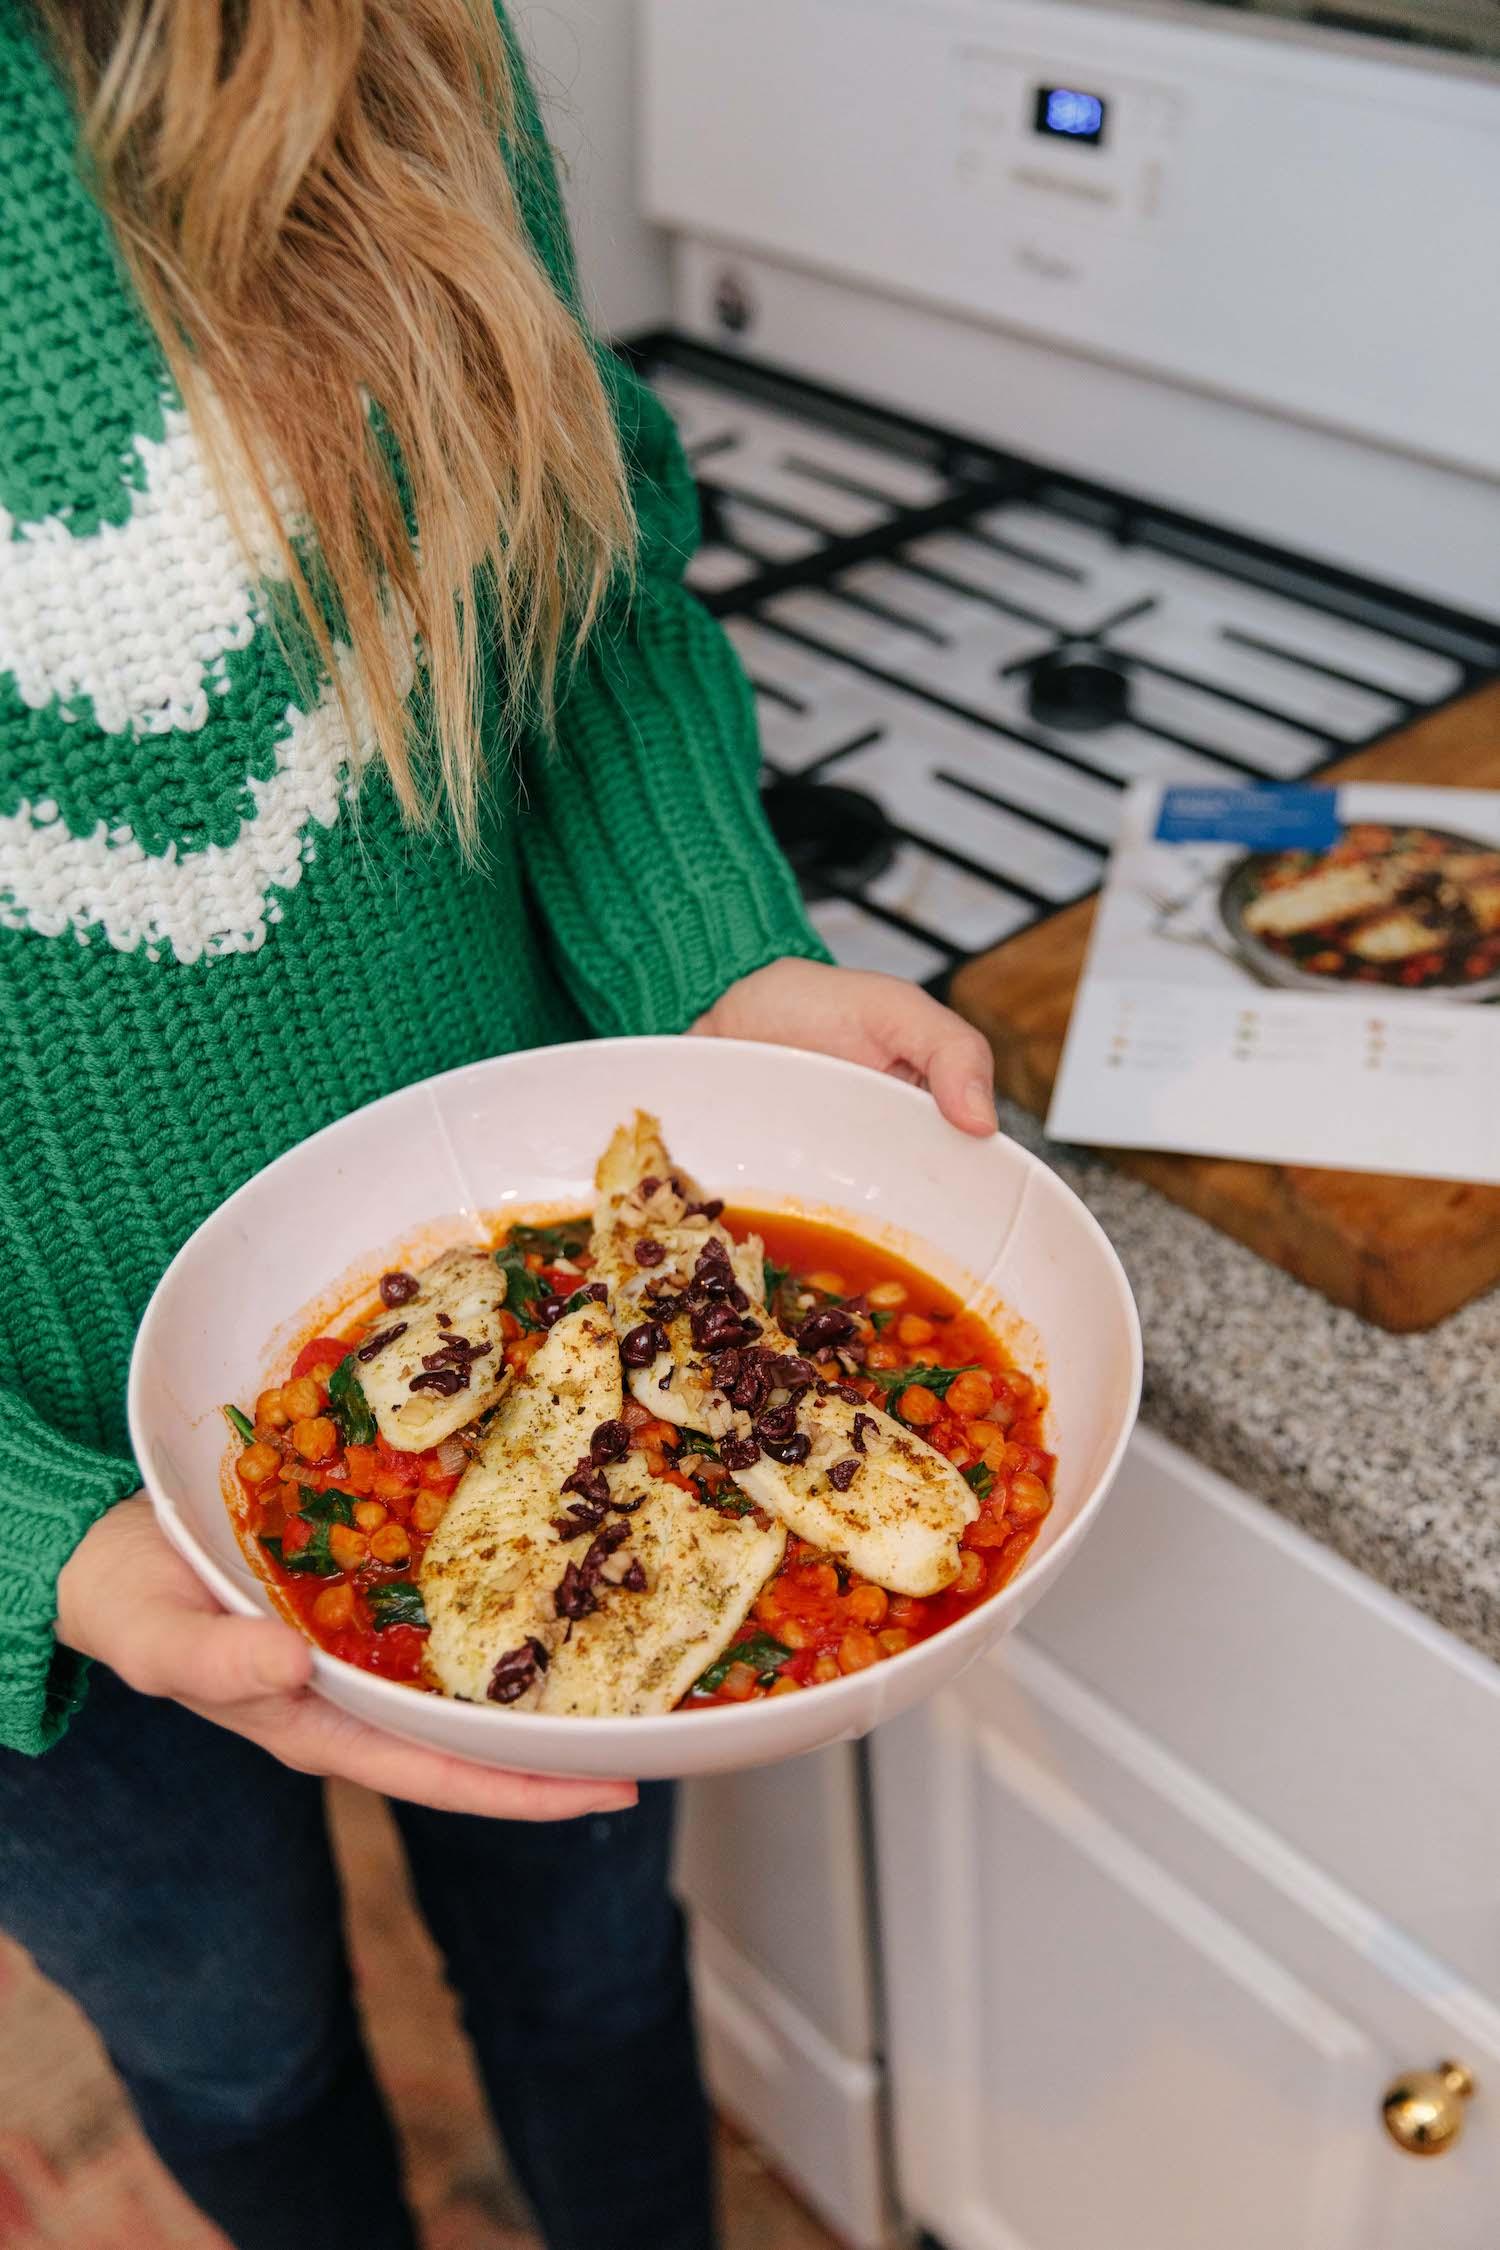 Blue Apron well balanced meals | A Healthier Mindset